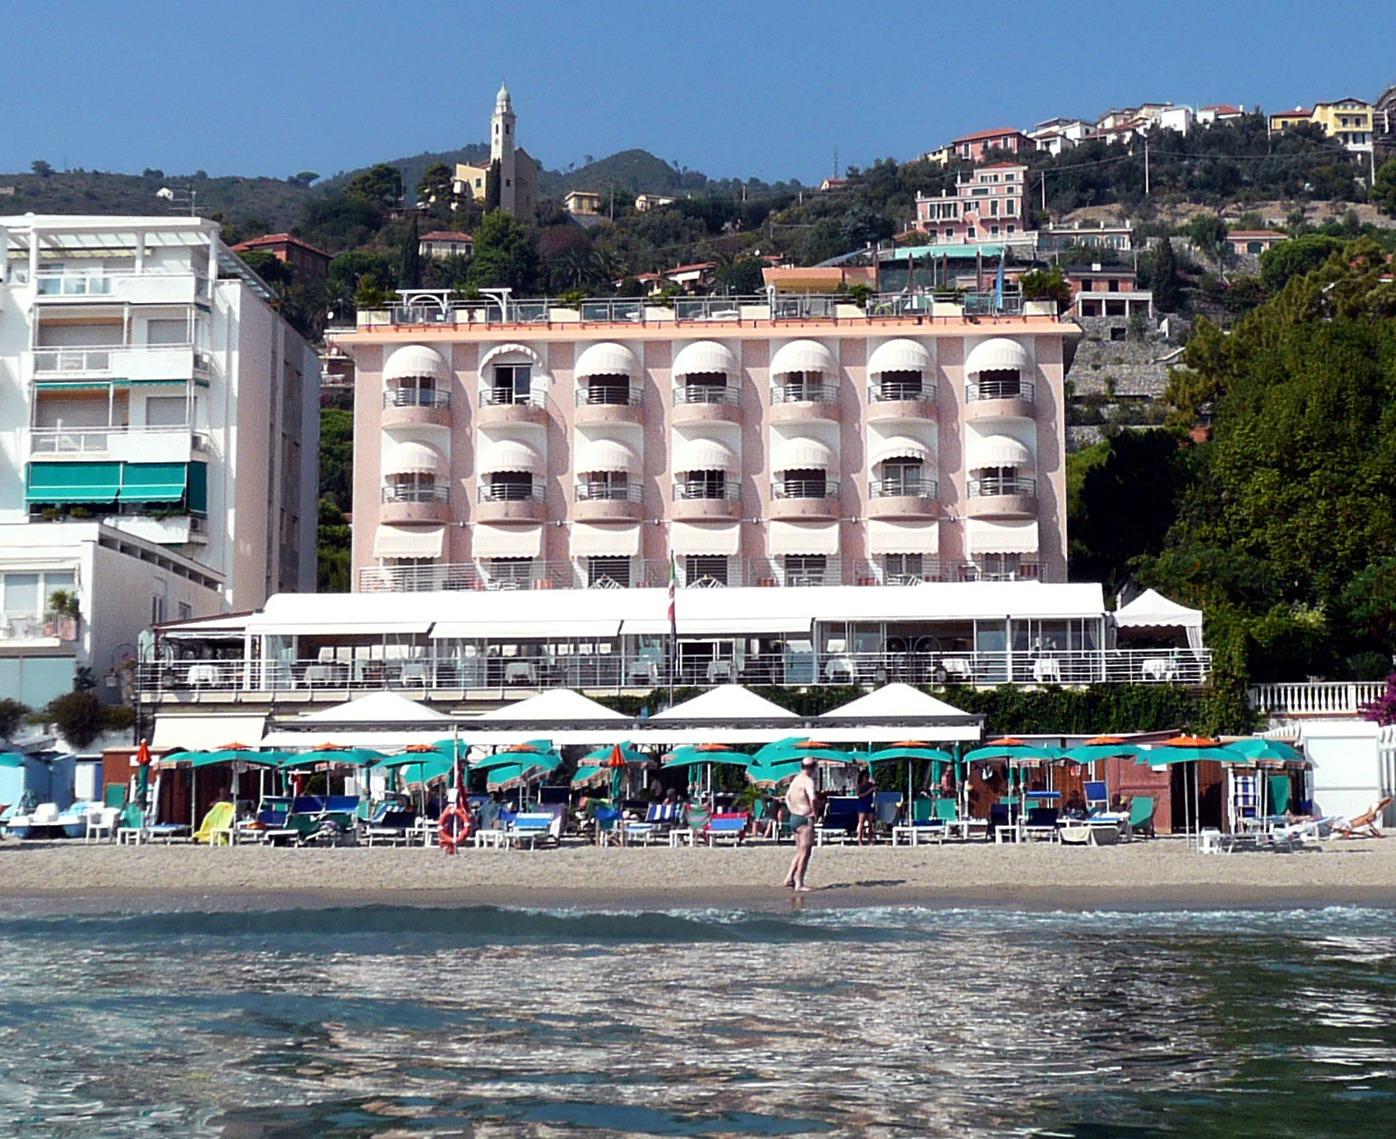 Best Hotel Le Terrazze Alassio Photos - Design Trends 2017 ...